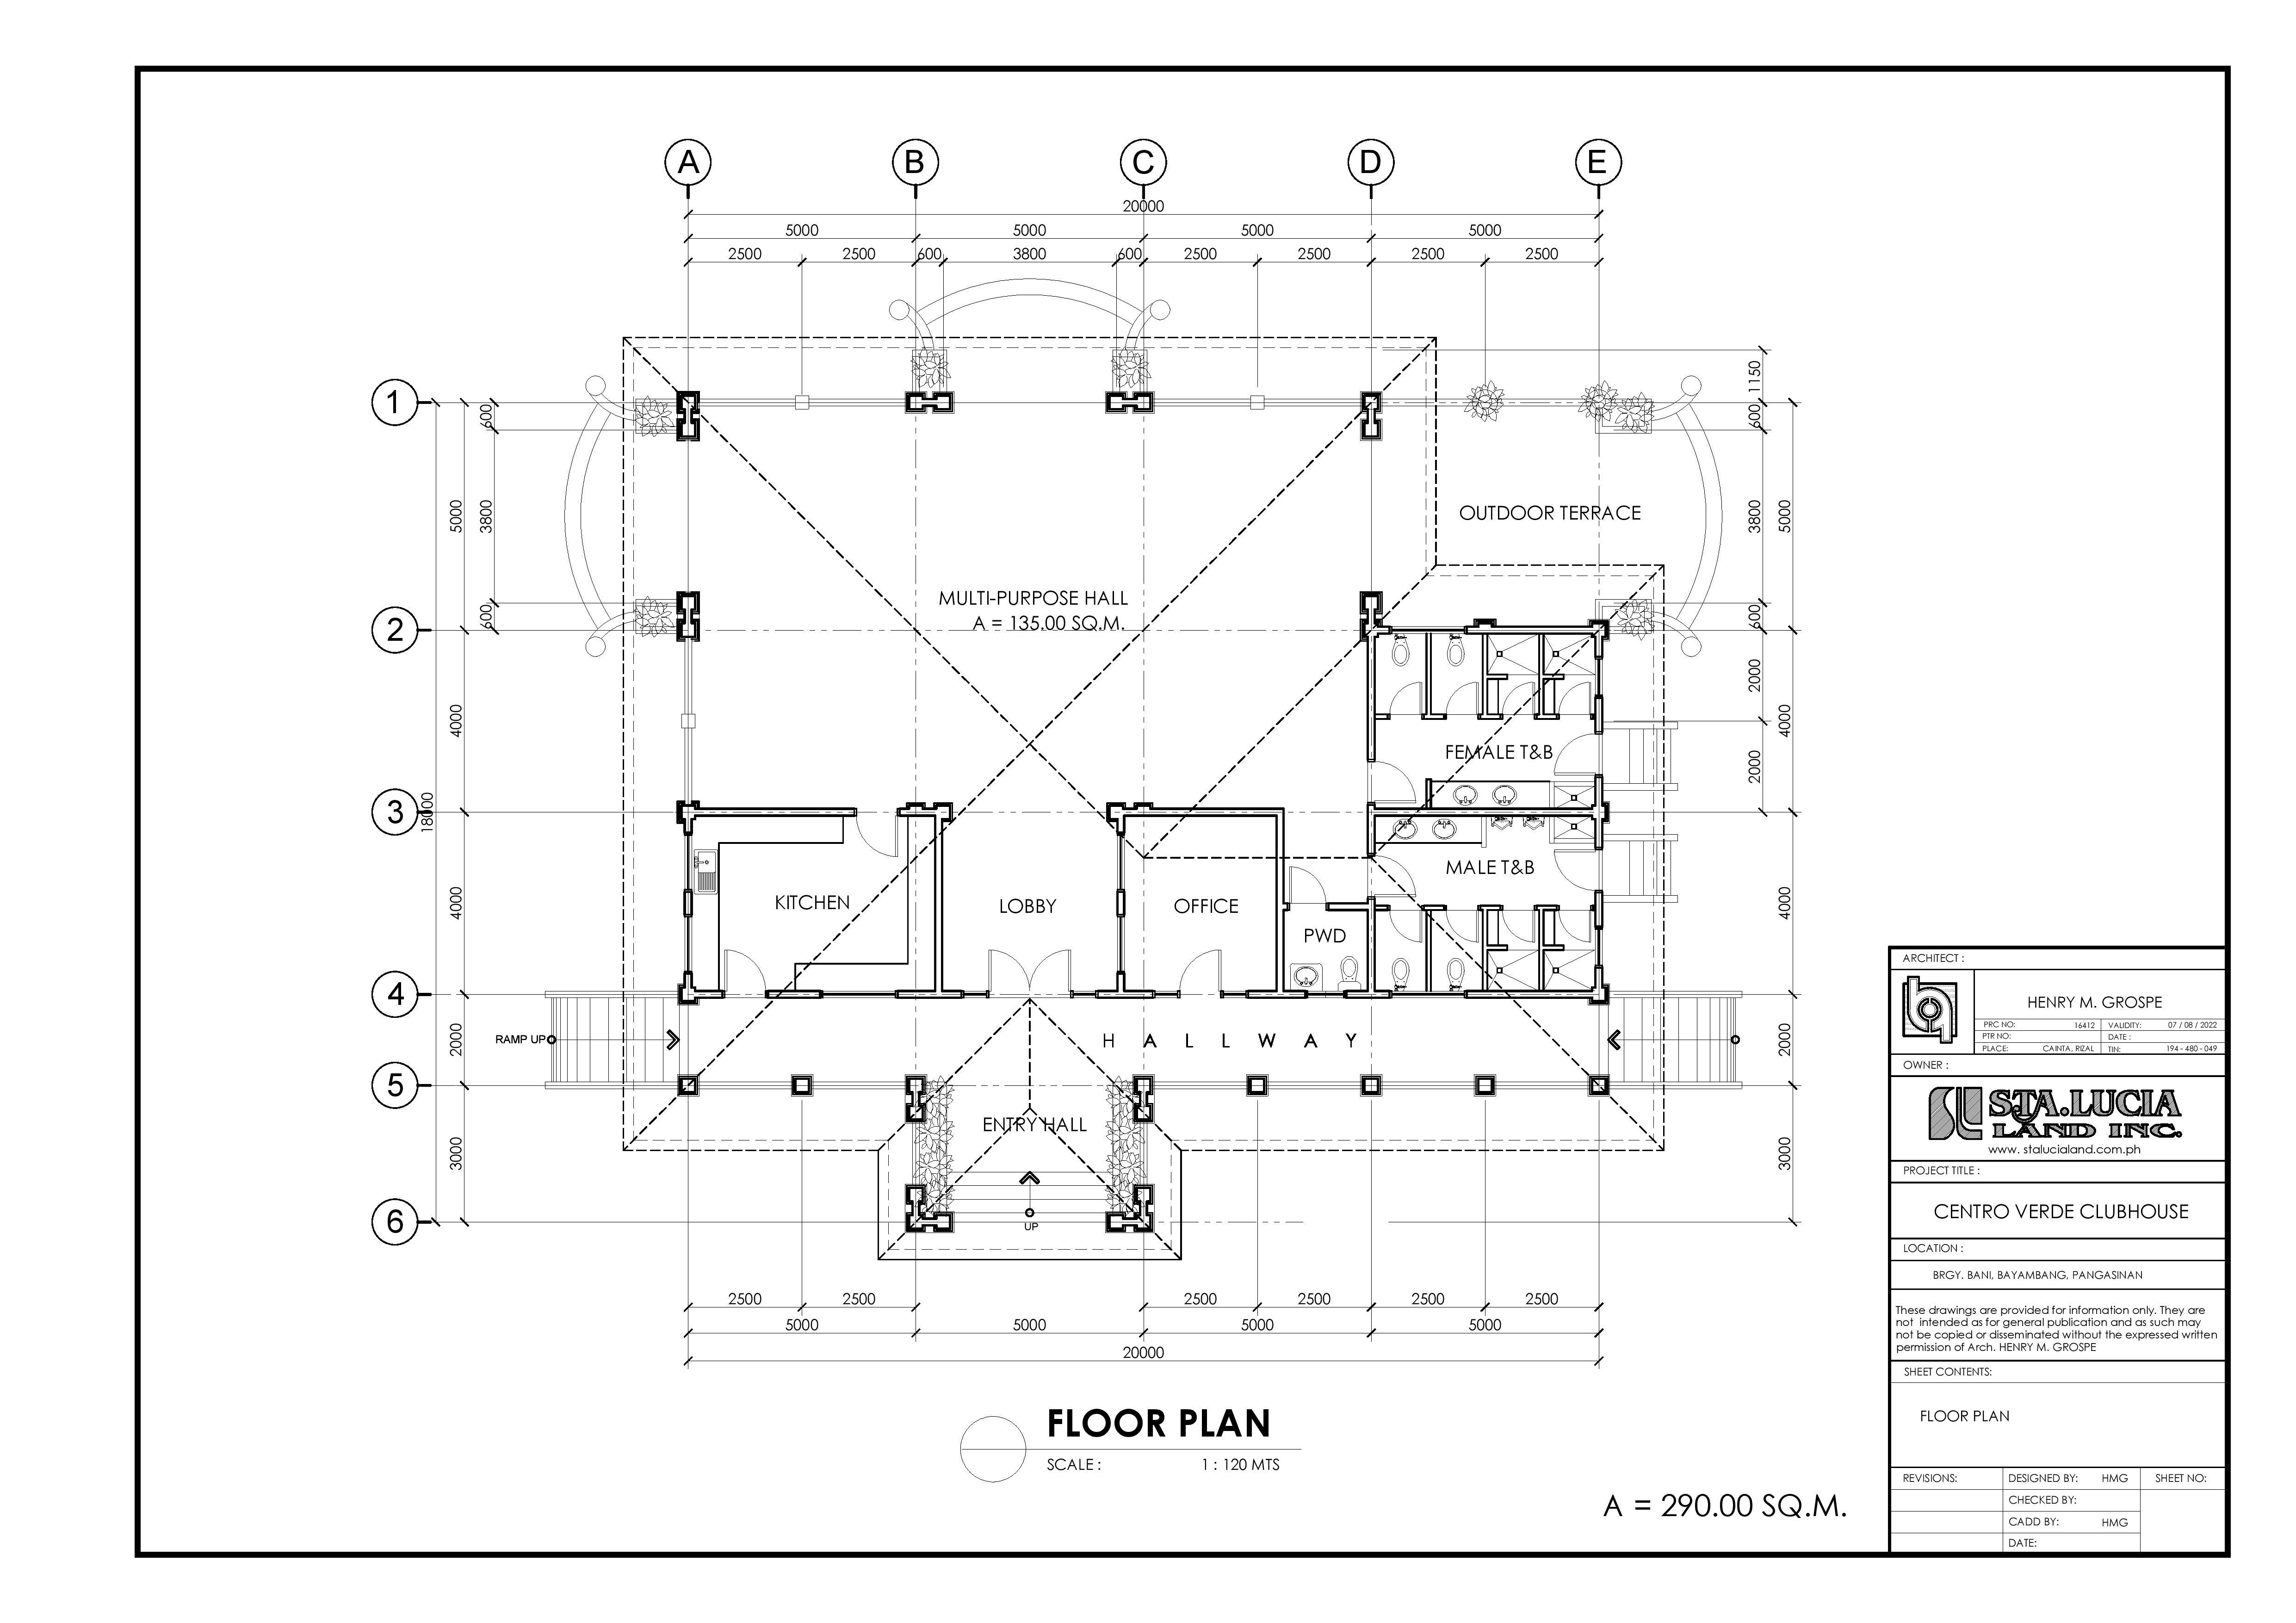 centro_verde___BAYAMBANG___CLUBHOUSE_FLOOR_PLAN_page_001.jpg